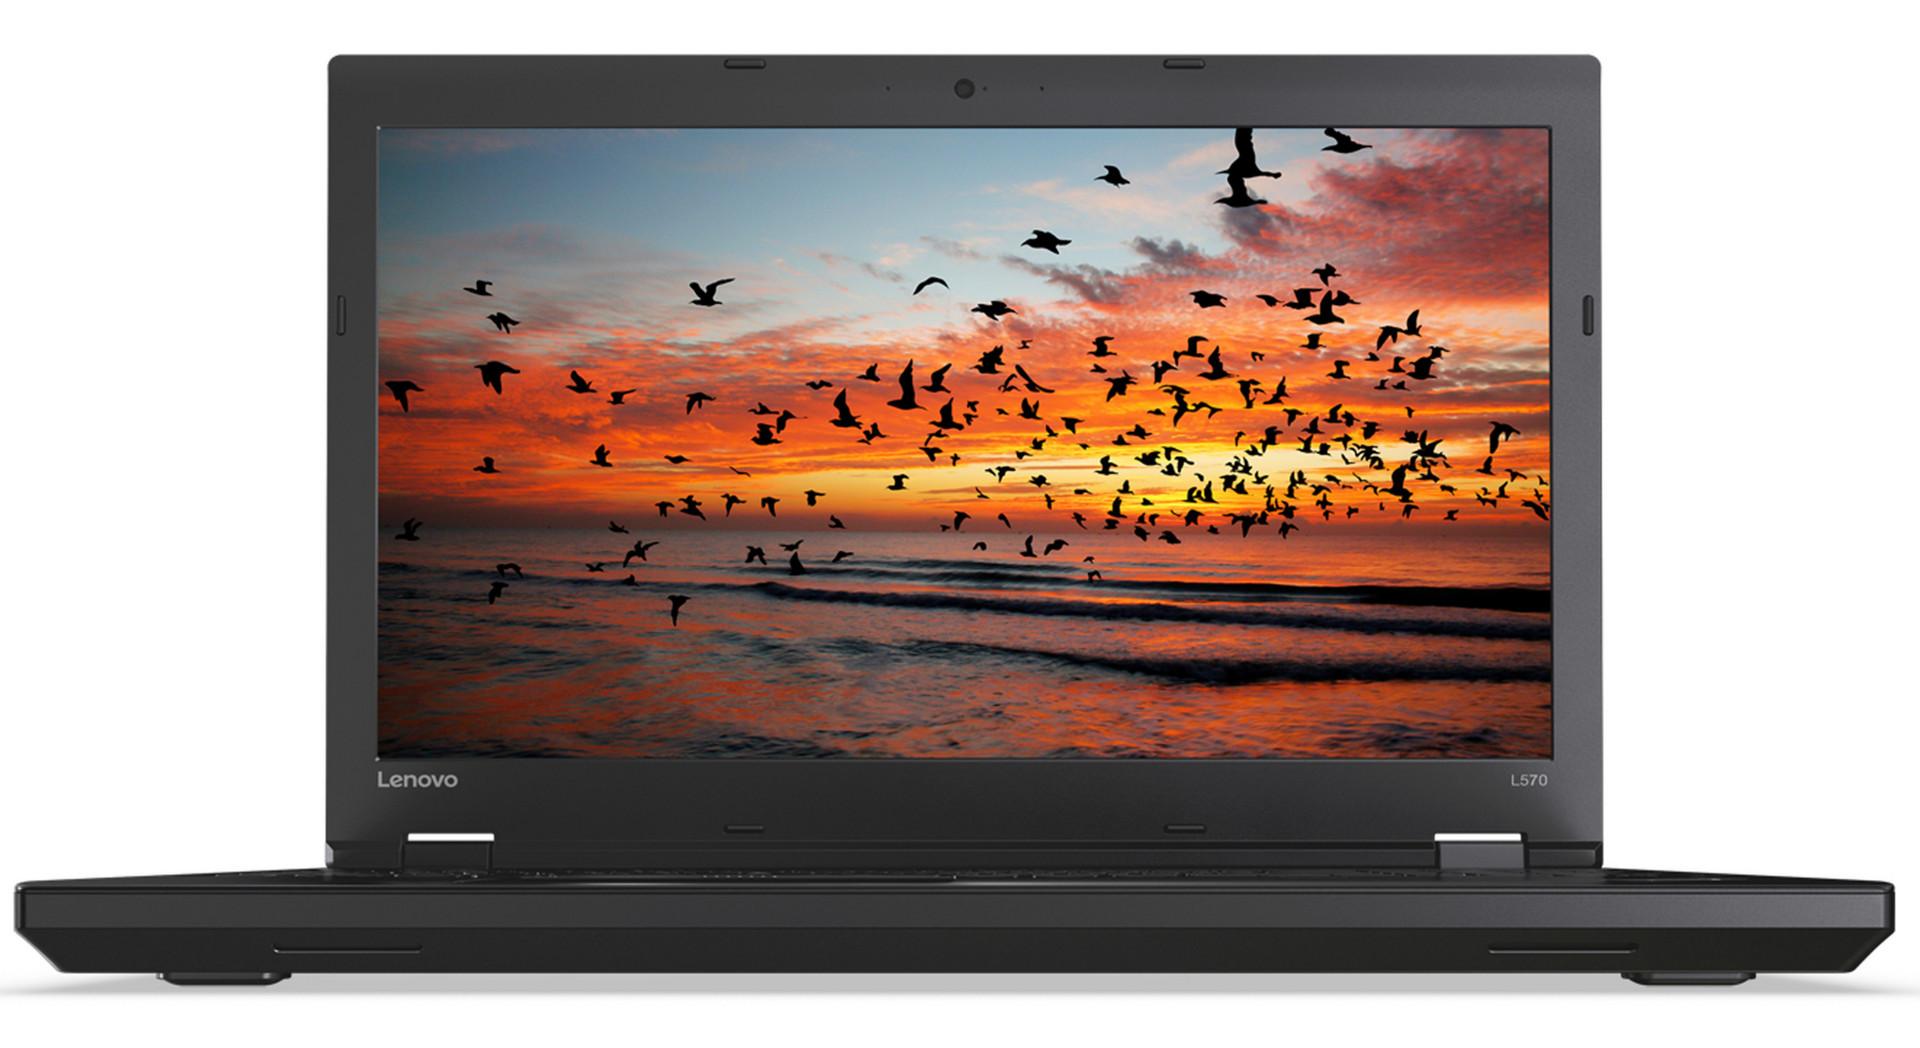 Lenovo ThinkPad L570 (7200U, Full HD) Laptop Review